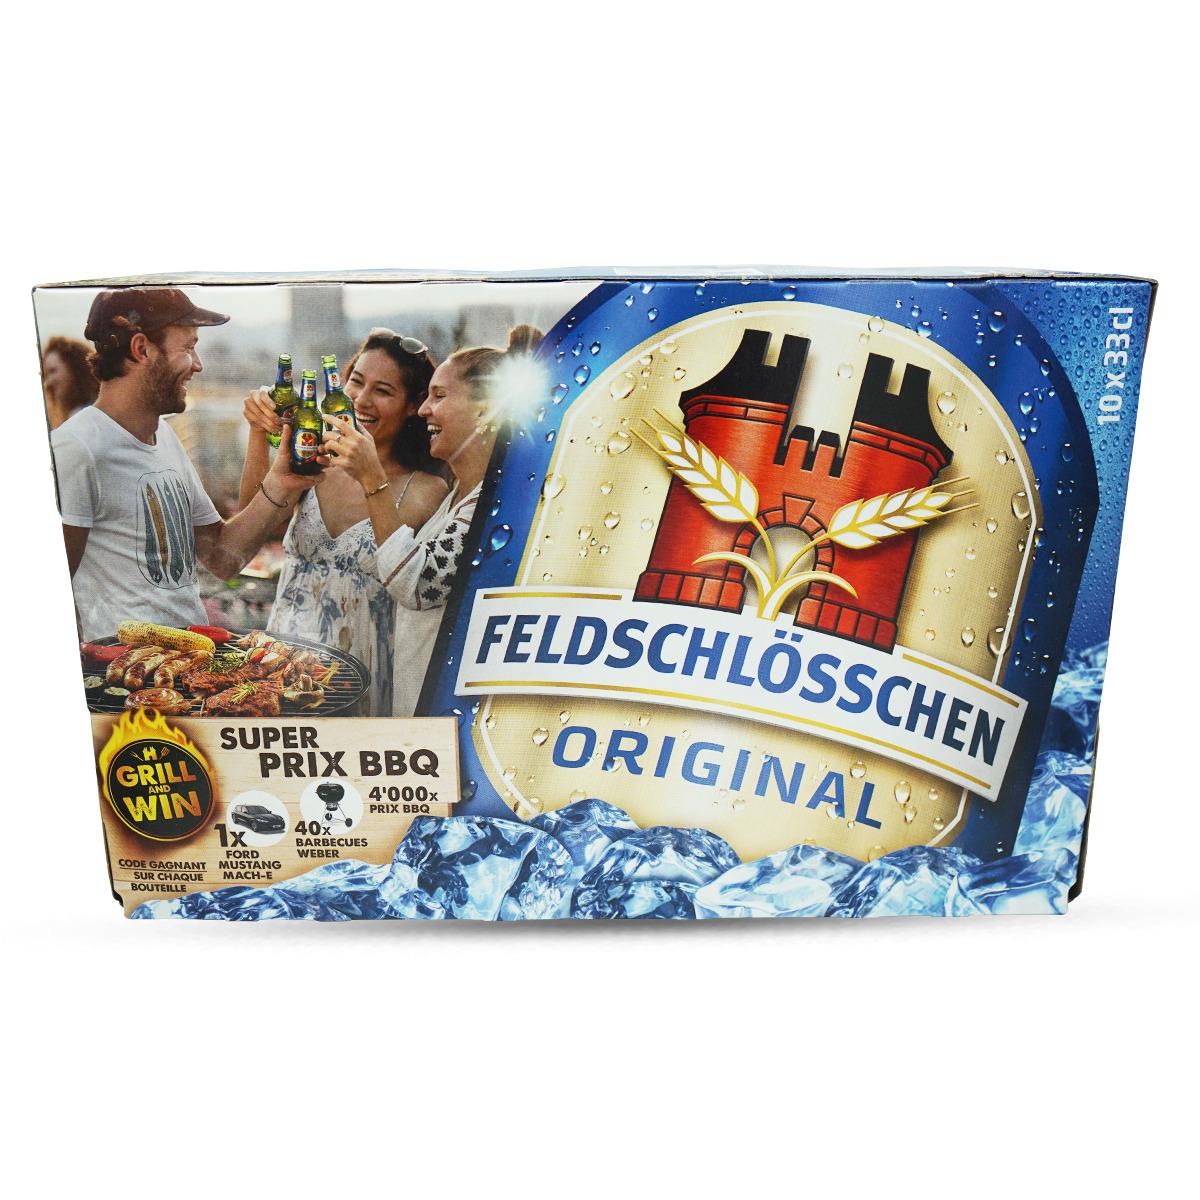 Feldschlösschen Original Lager Bier